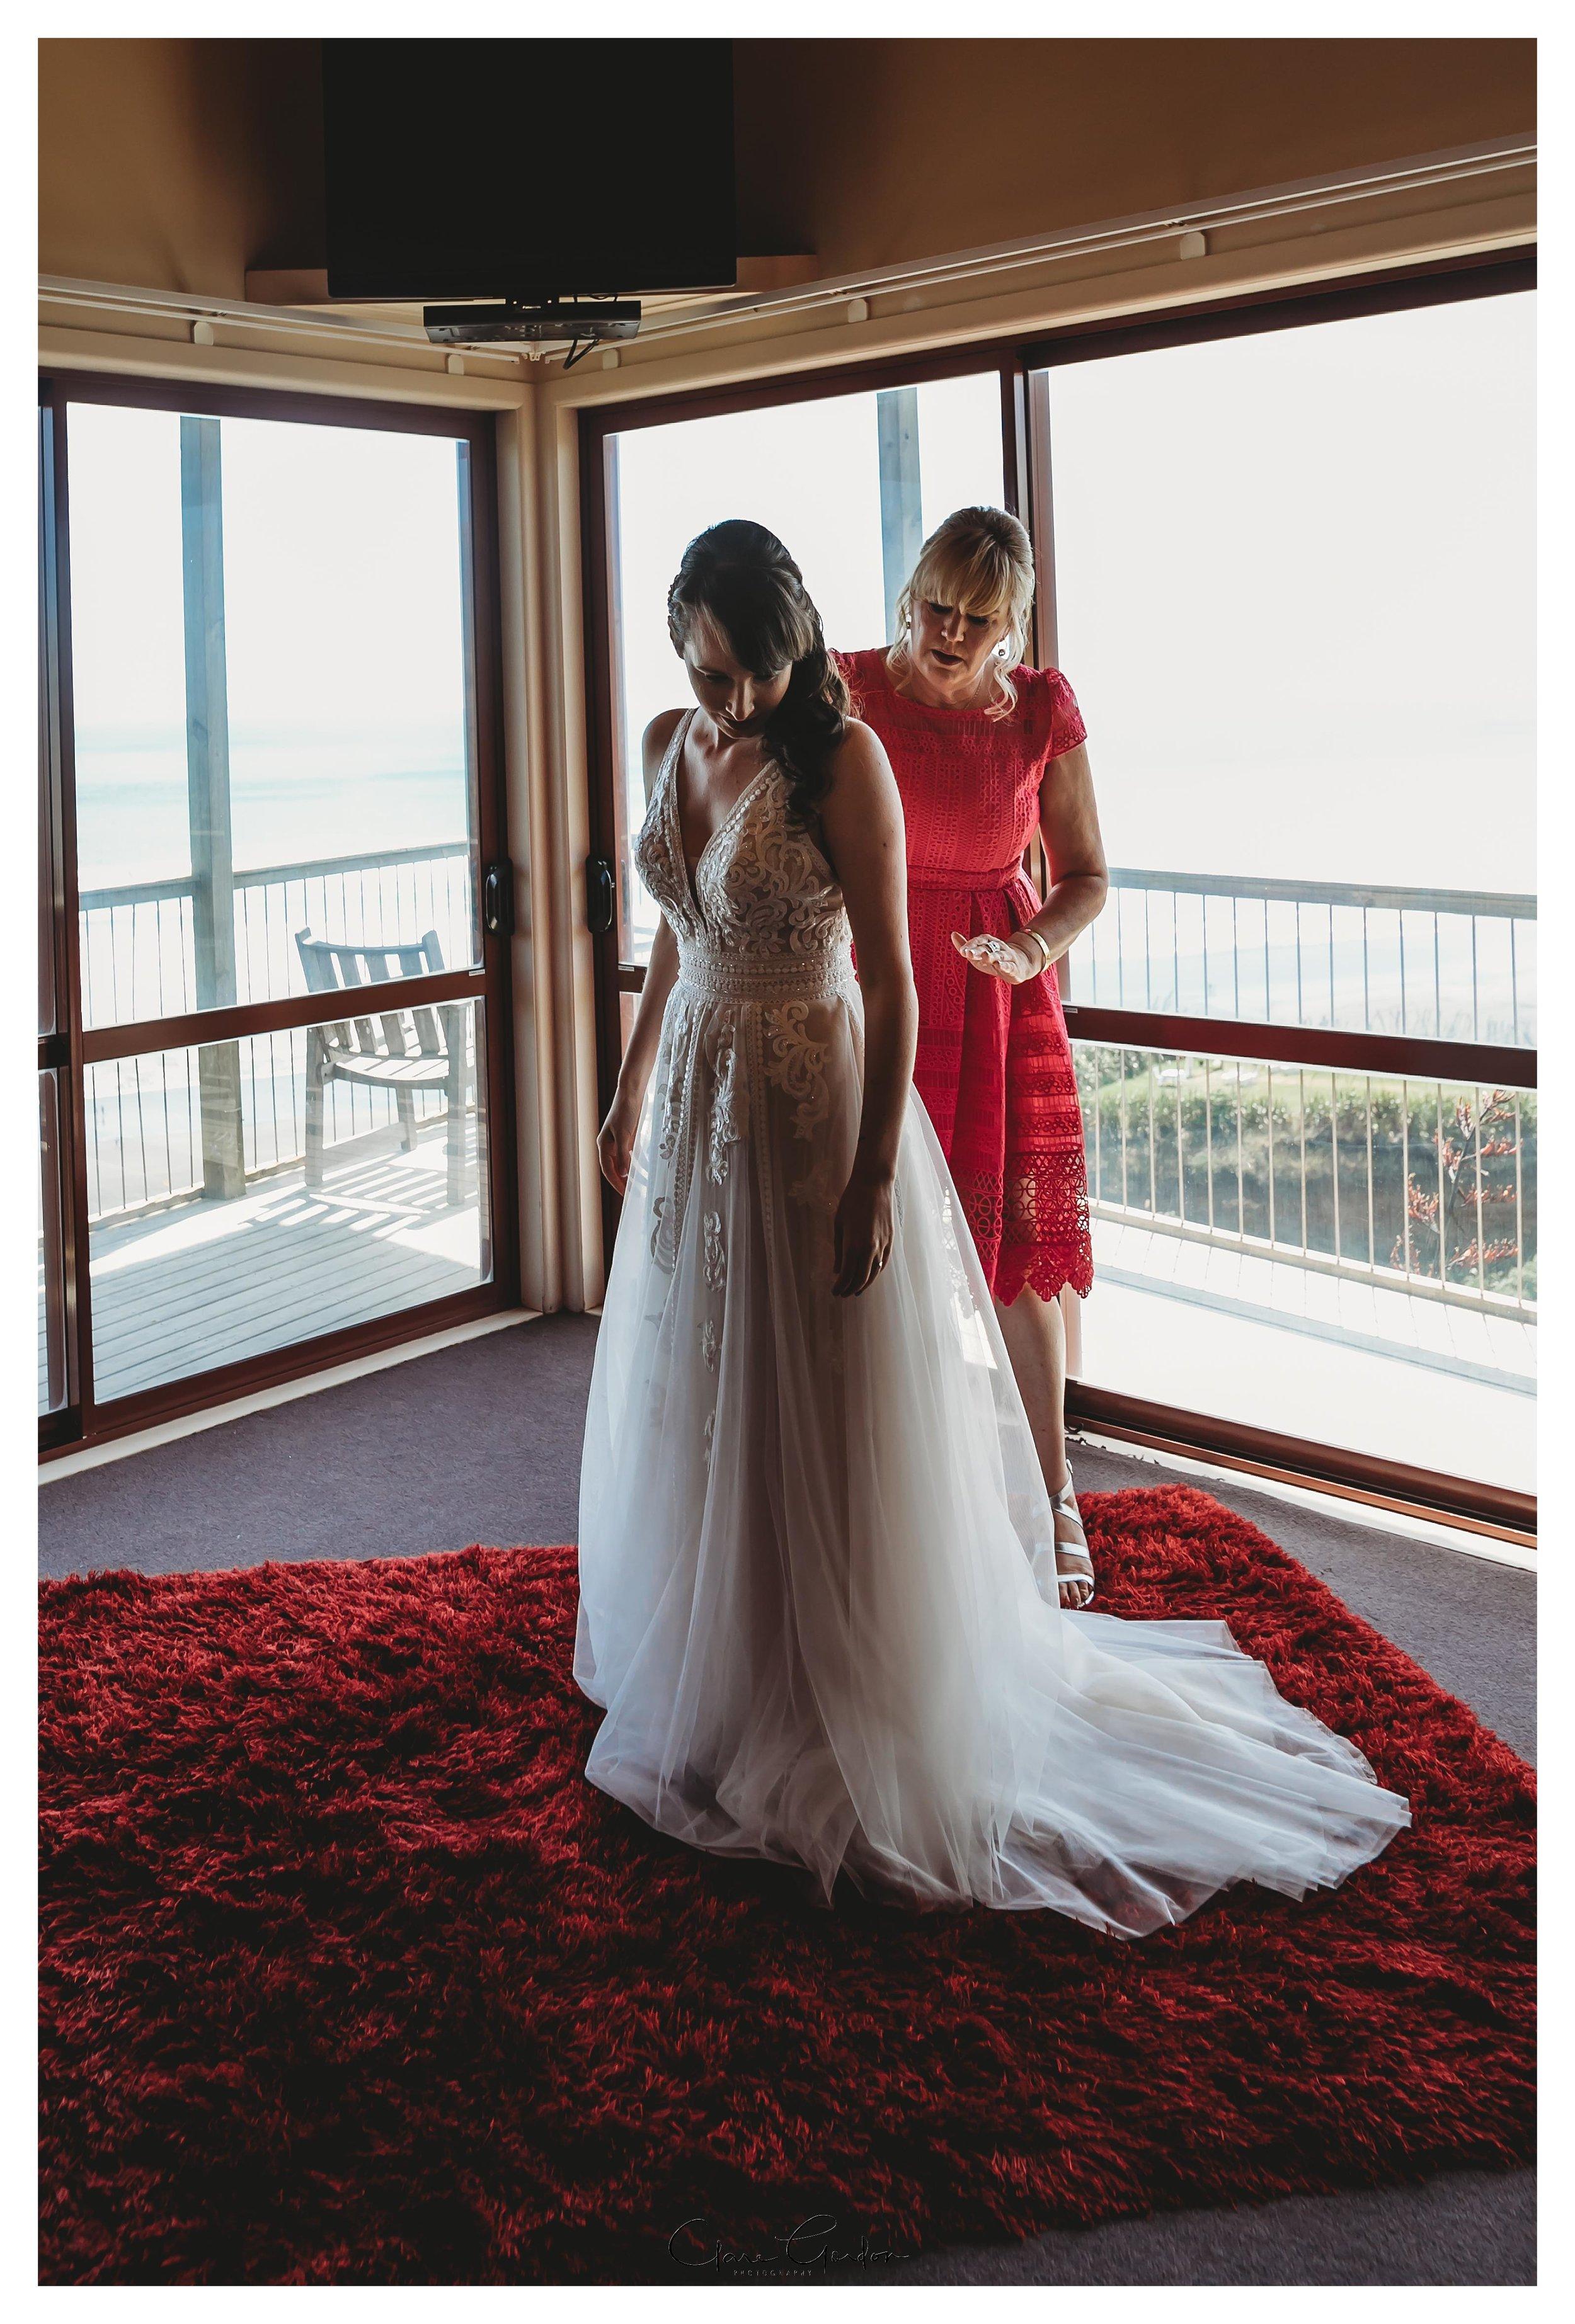 Castaways-resort-waiuku-Wedding-photos-Karioitahi-beach (47).jpg